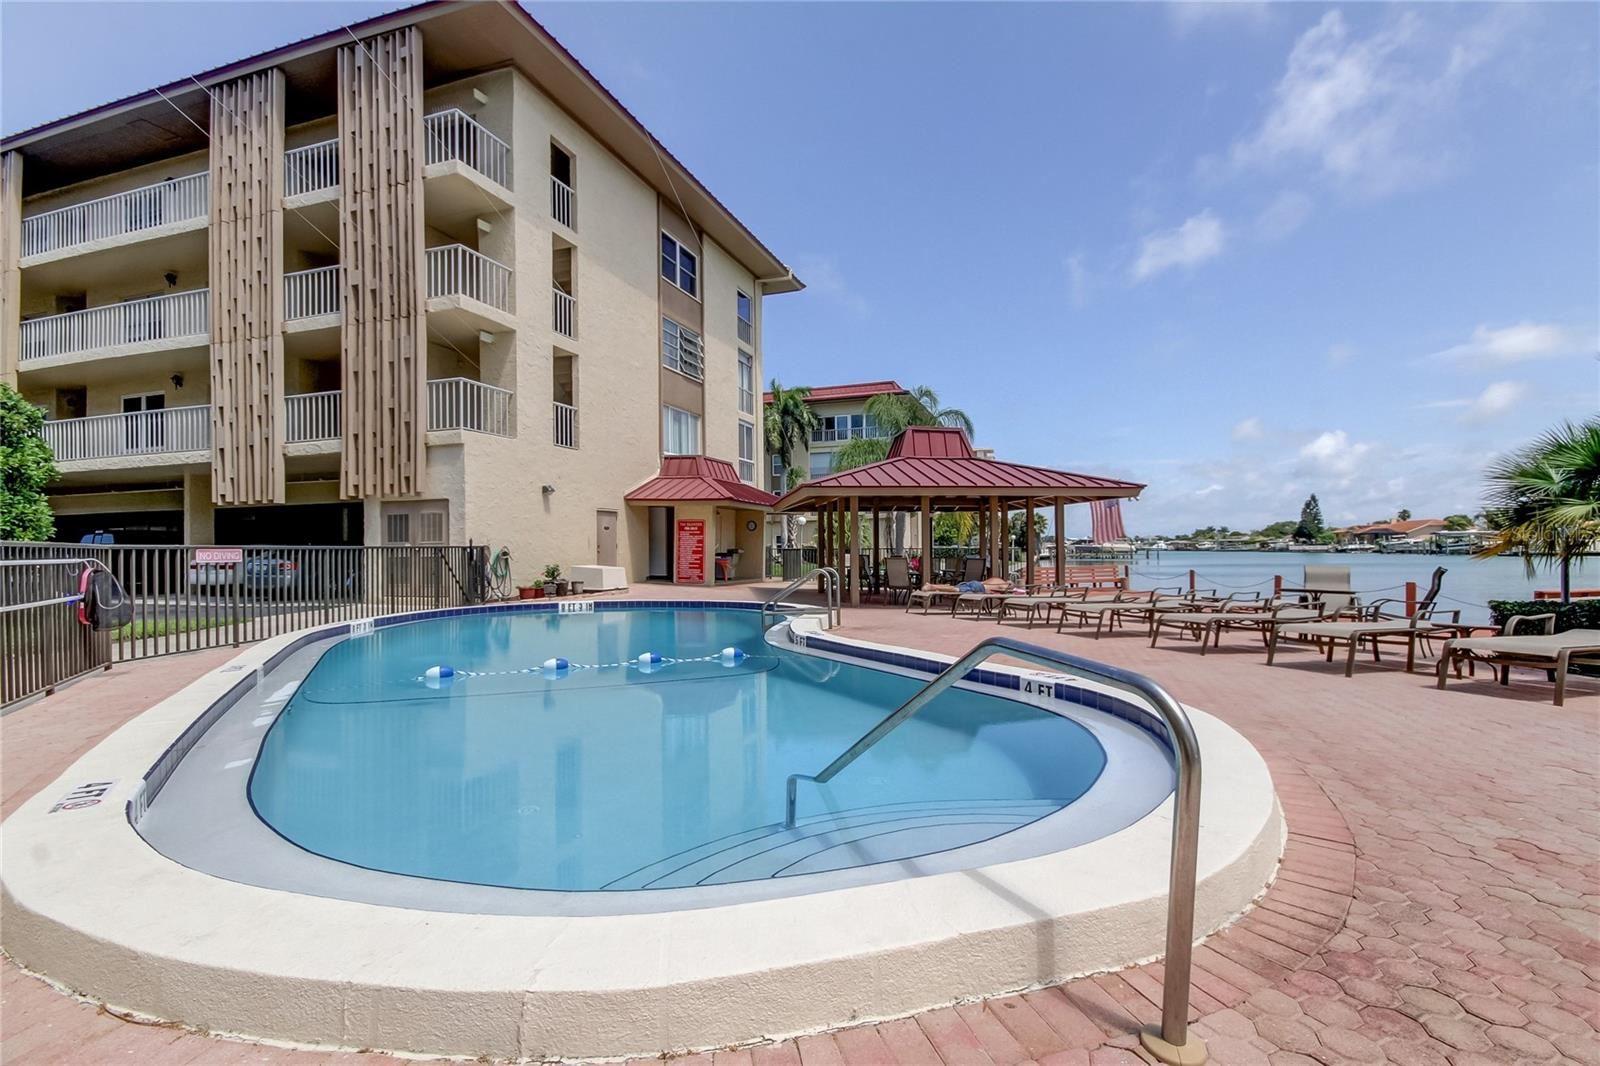 113 ISLAND WAY #221, Clearwater Beach, FL 33767 - #: U8122729